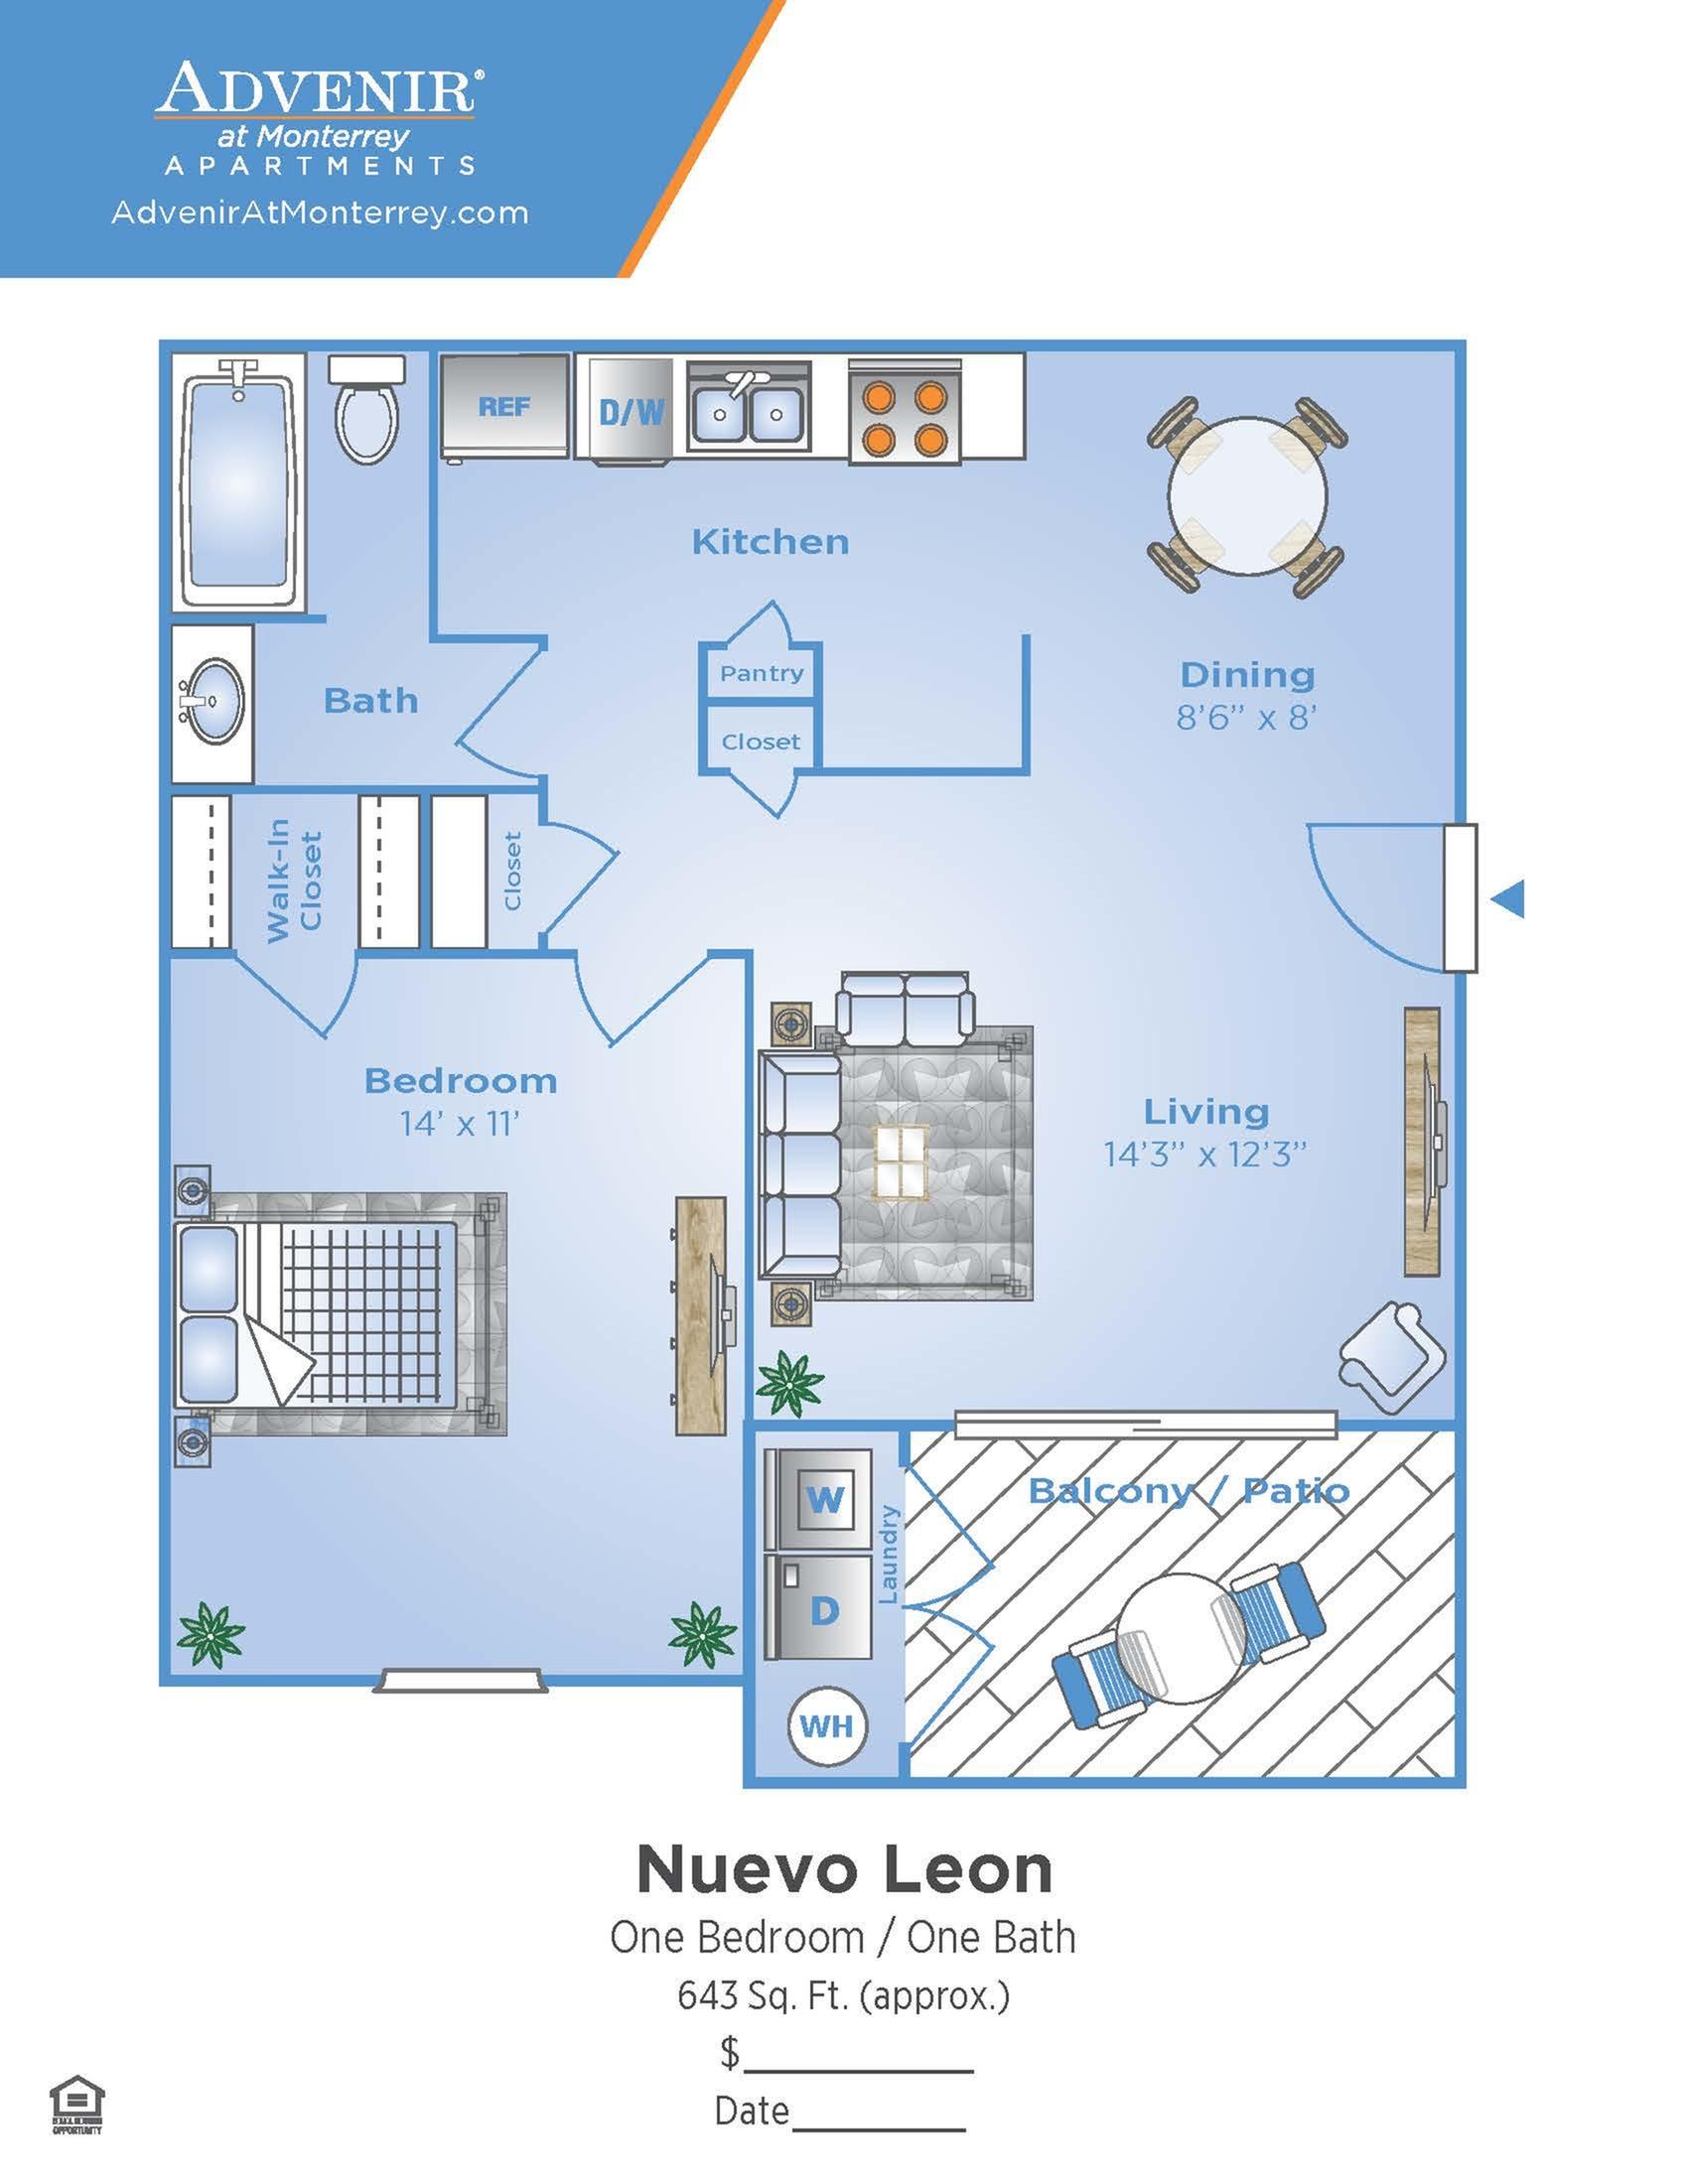 1 Bedroom Floor Plan | Venice FL Apartments | Advenir at Monterrey